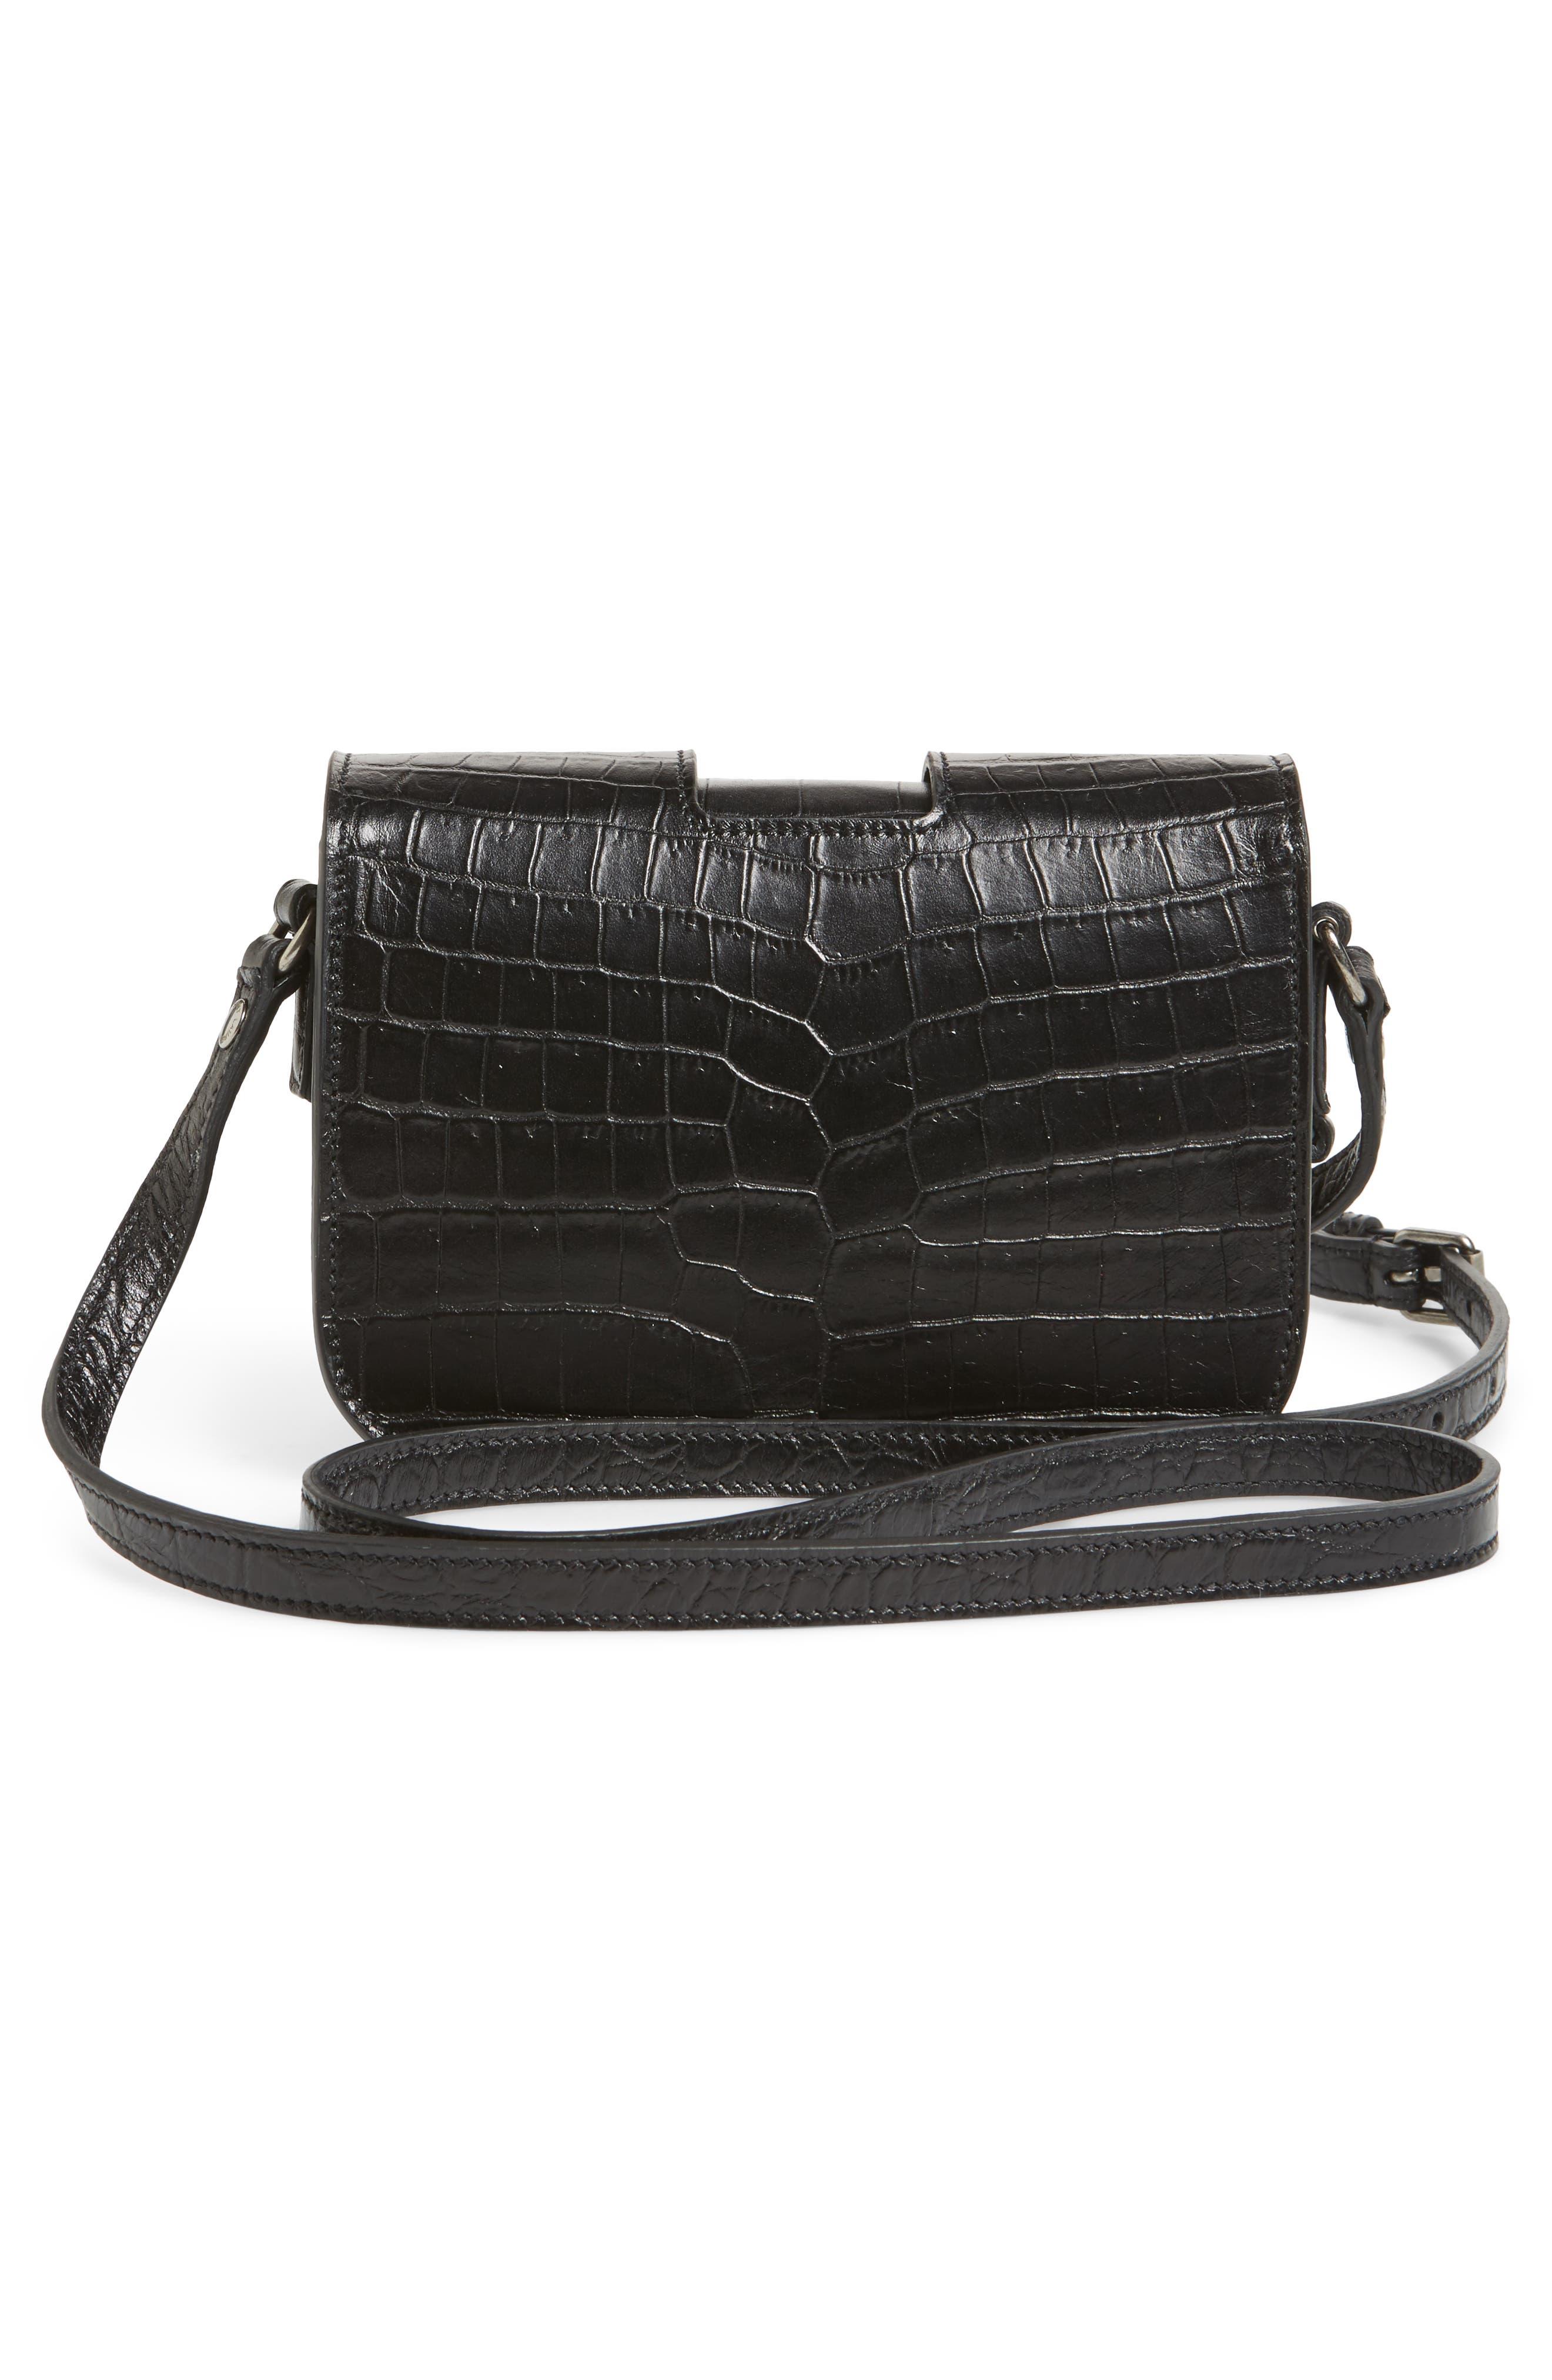 Croc Embossed Leather Crossbody Bag,                             Alternate thumbnail 3, color,                             Noir